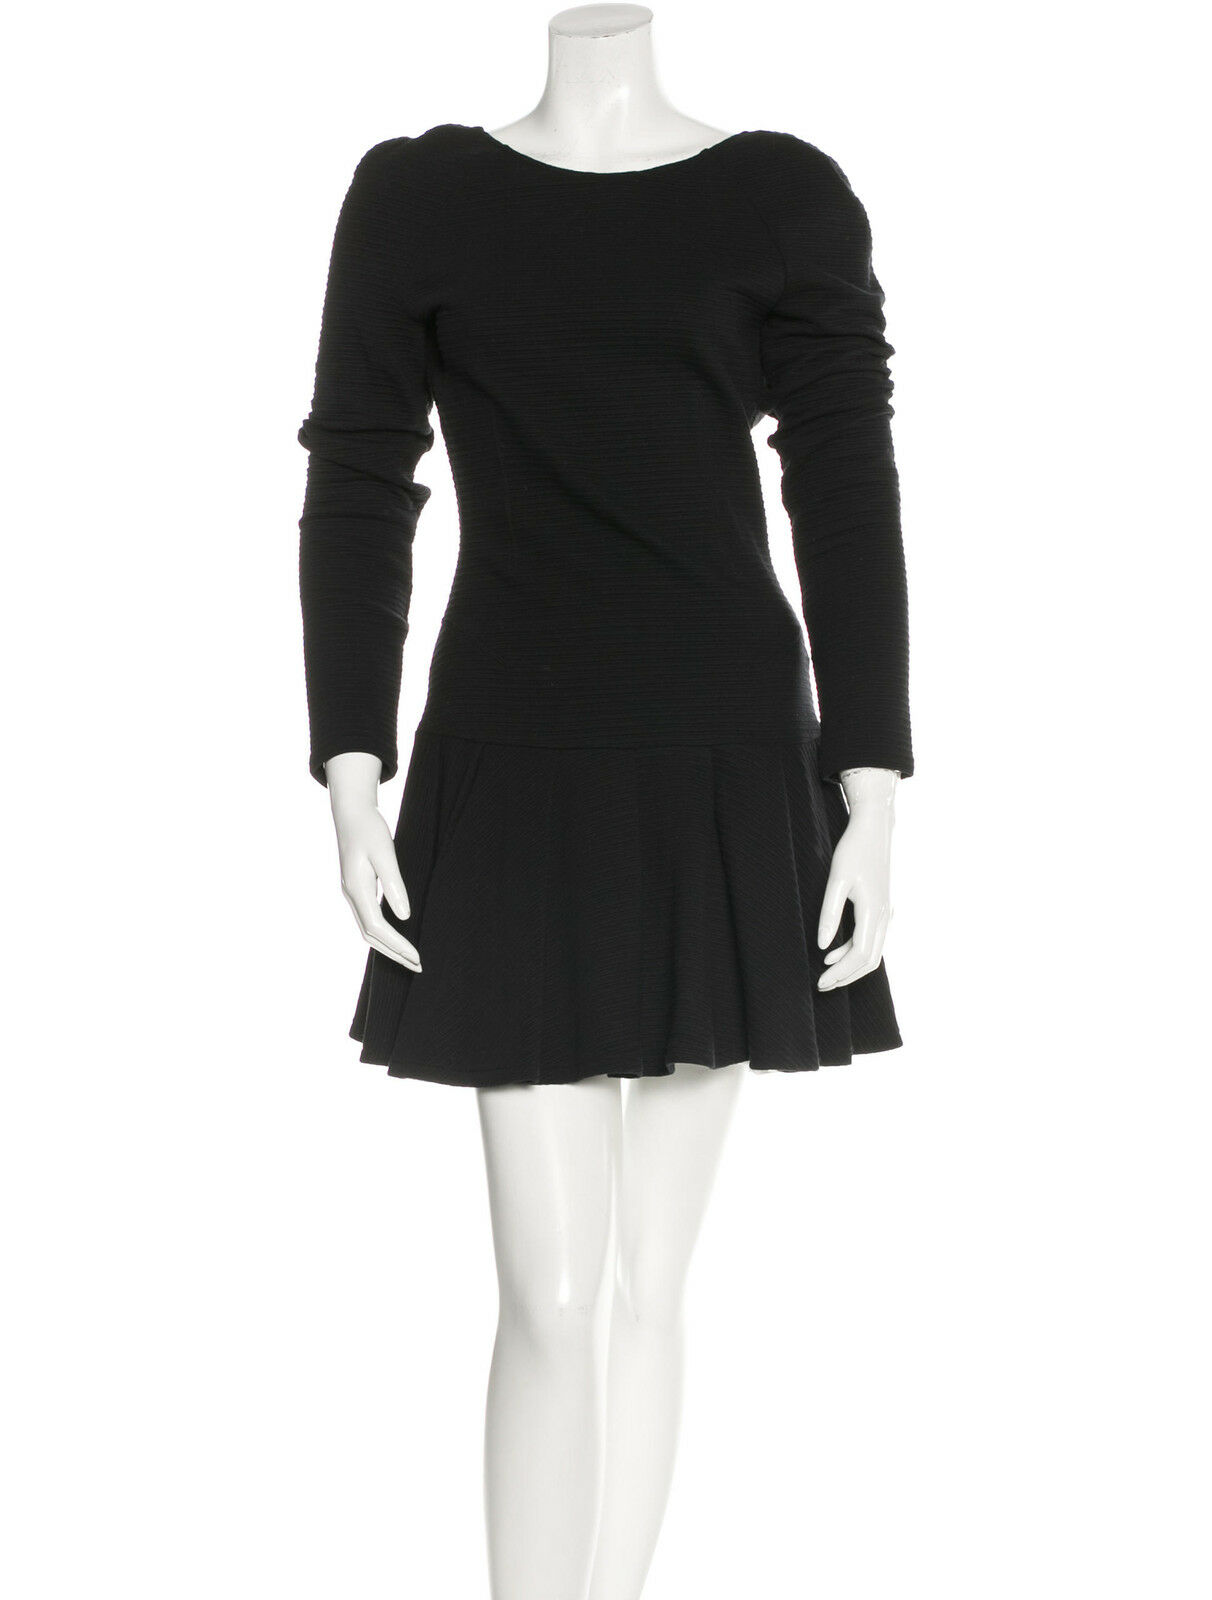 KENZO PARIS schwarz Cotton Long Sleeve Mini Dress Low Back Sz Large Never Worn EUC